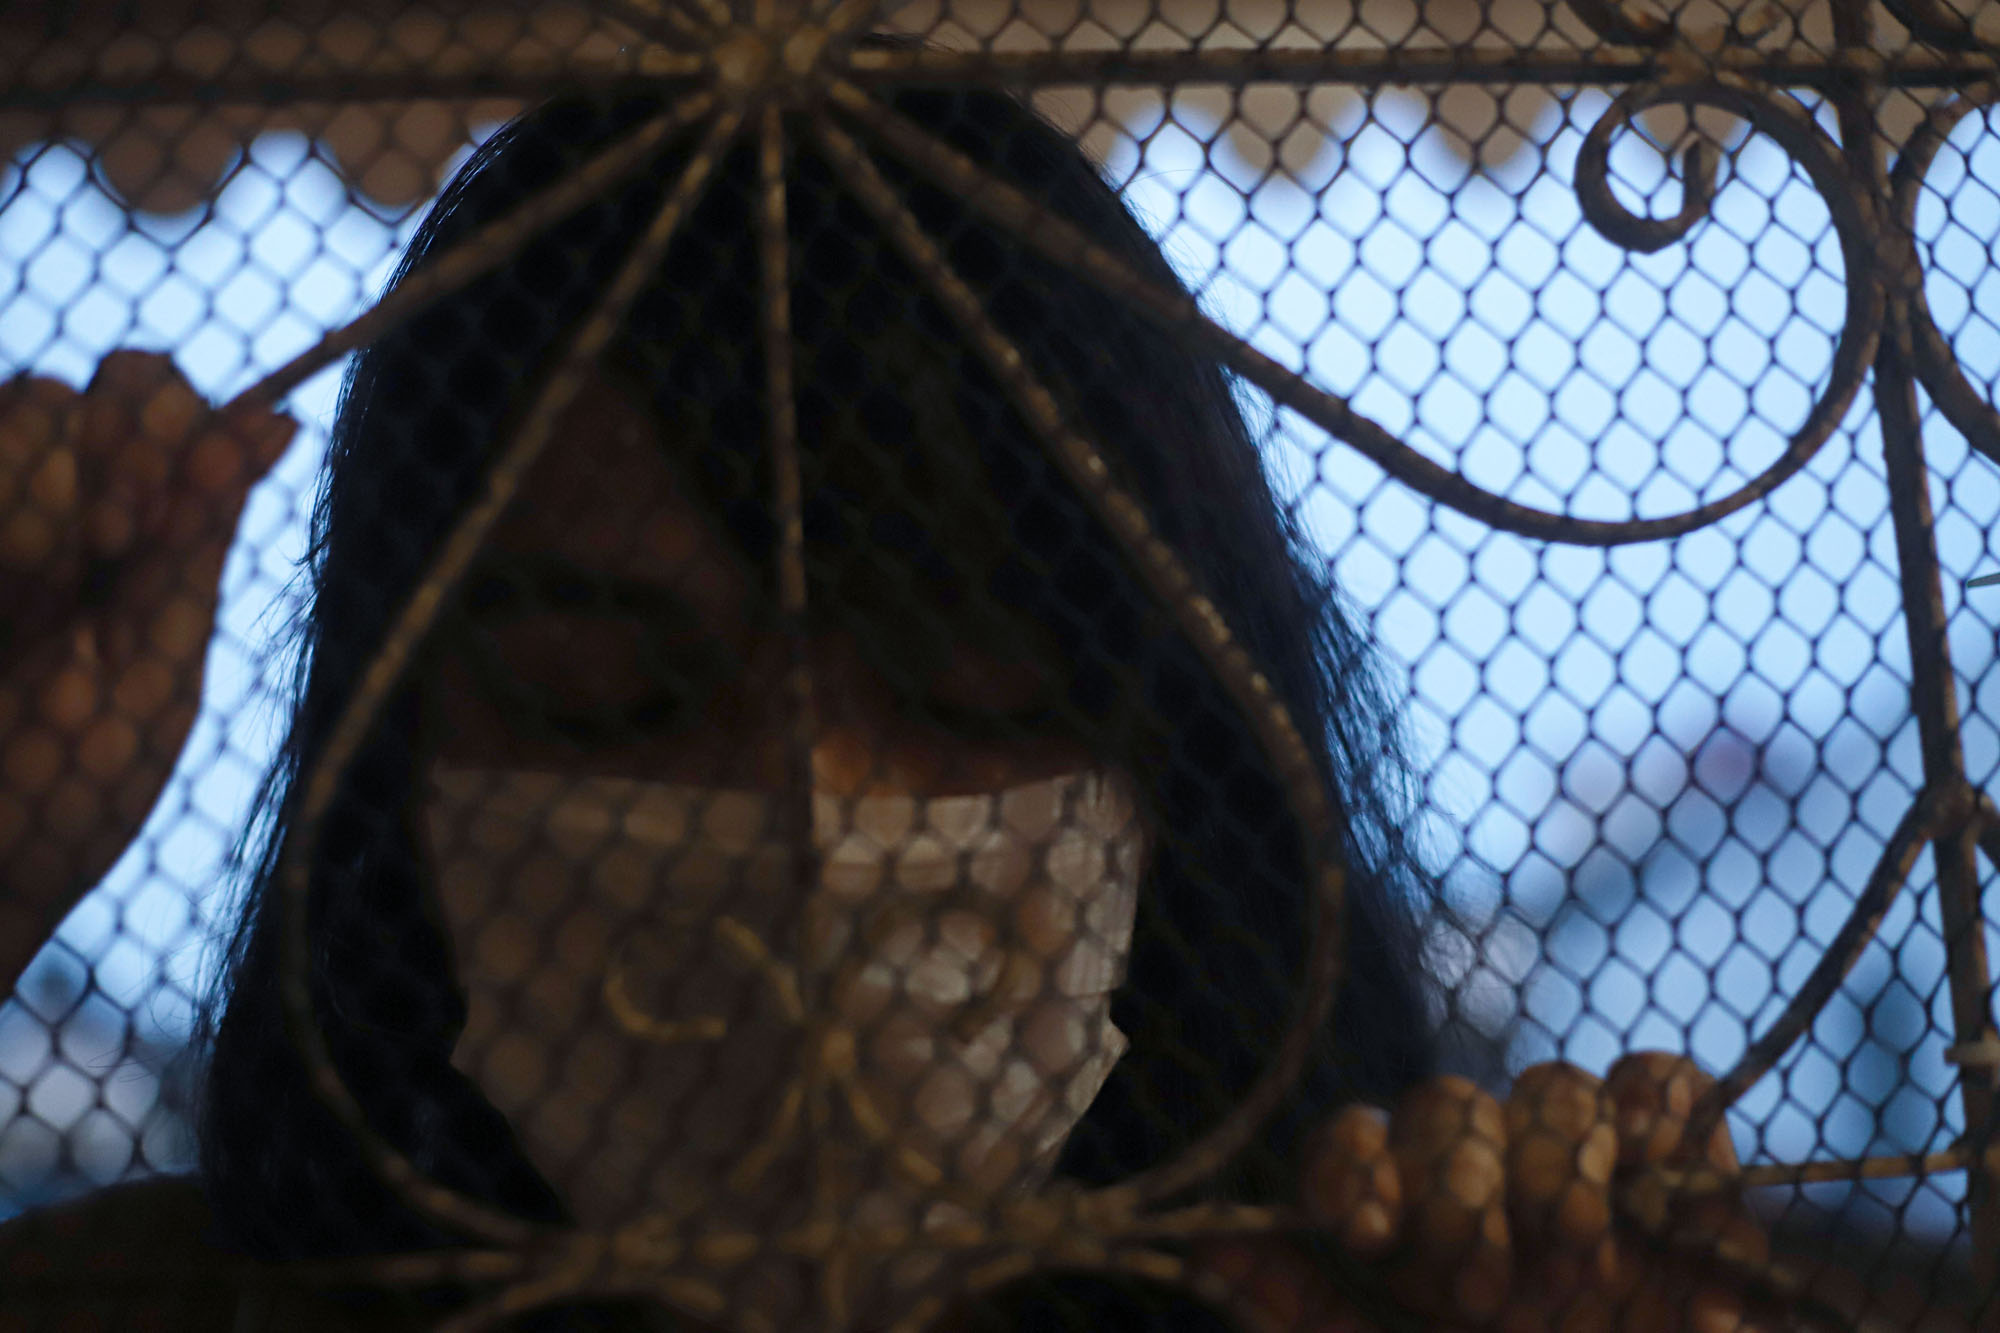 No Pará crime de feminicídio aumentou 100% na pandemia